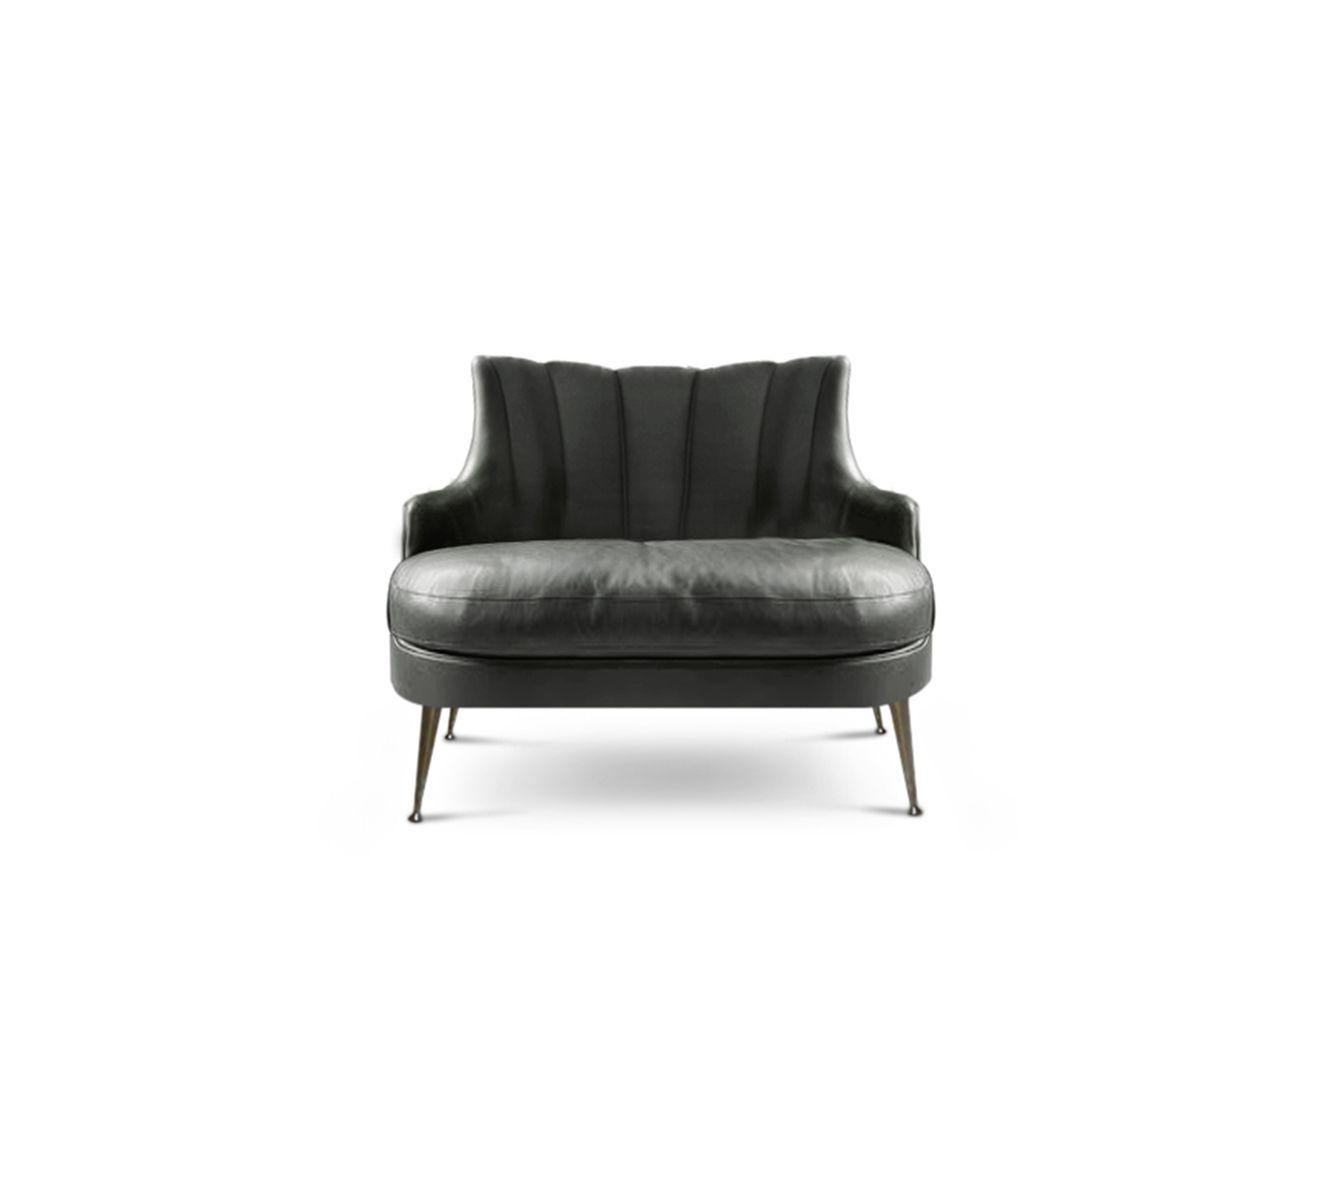 PLUM ARMCHAIR Brabbu | Contemporary home furniture ...